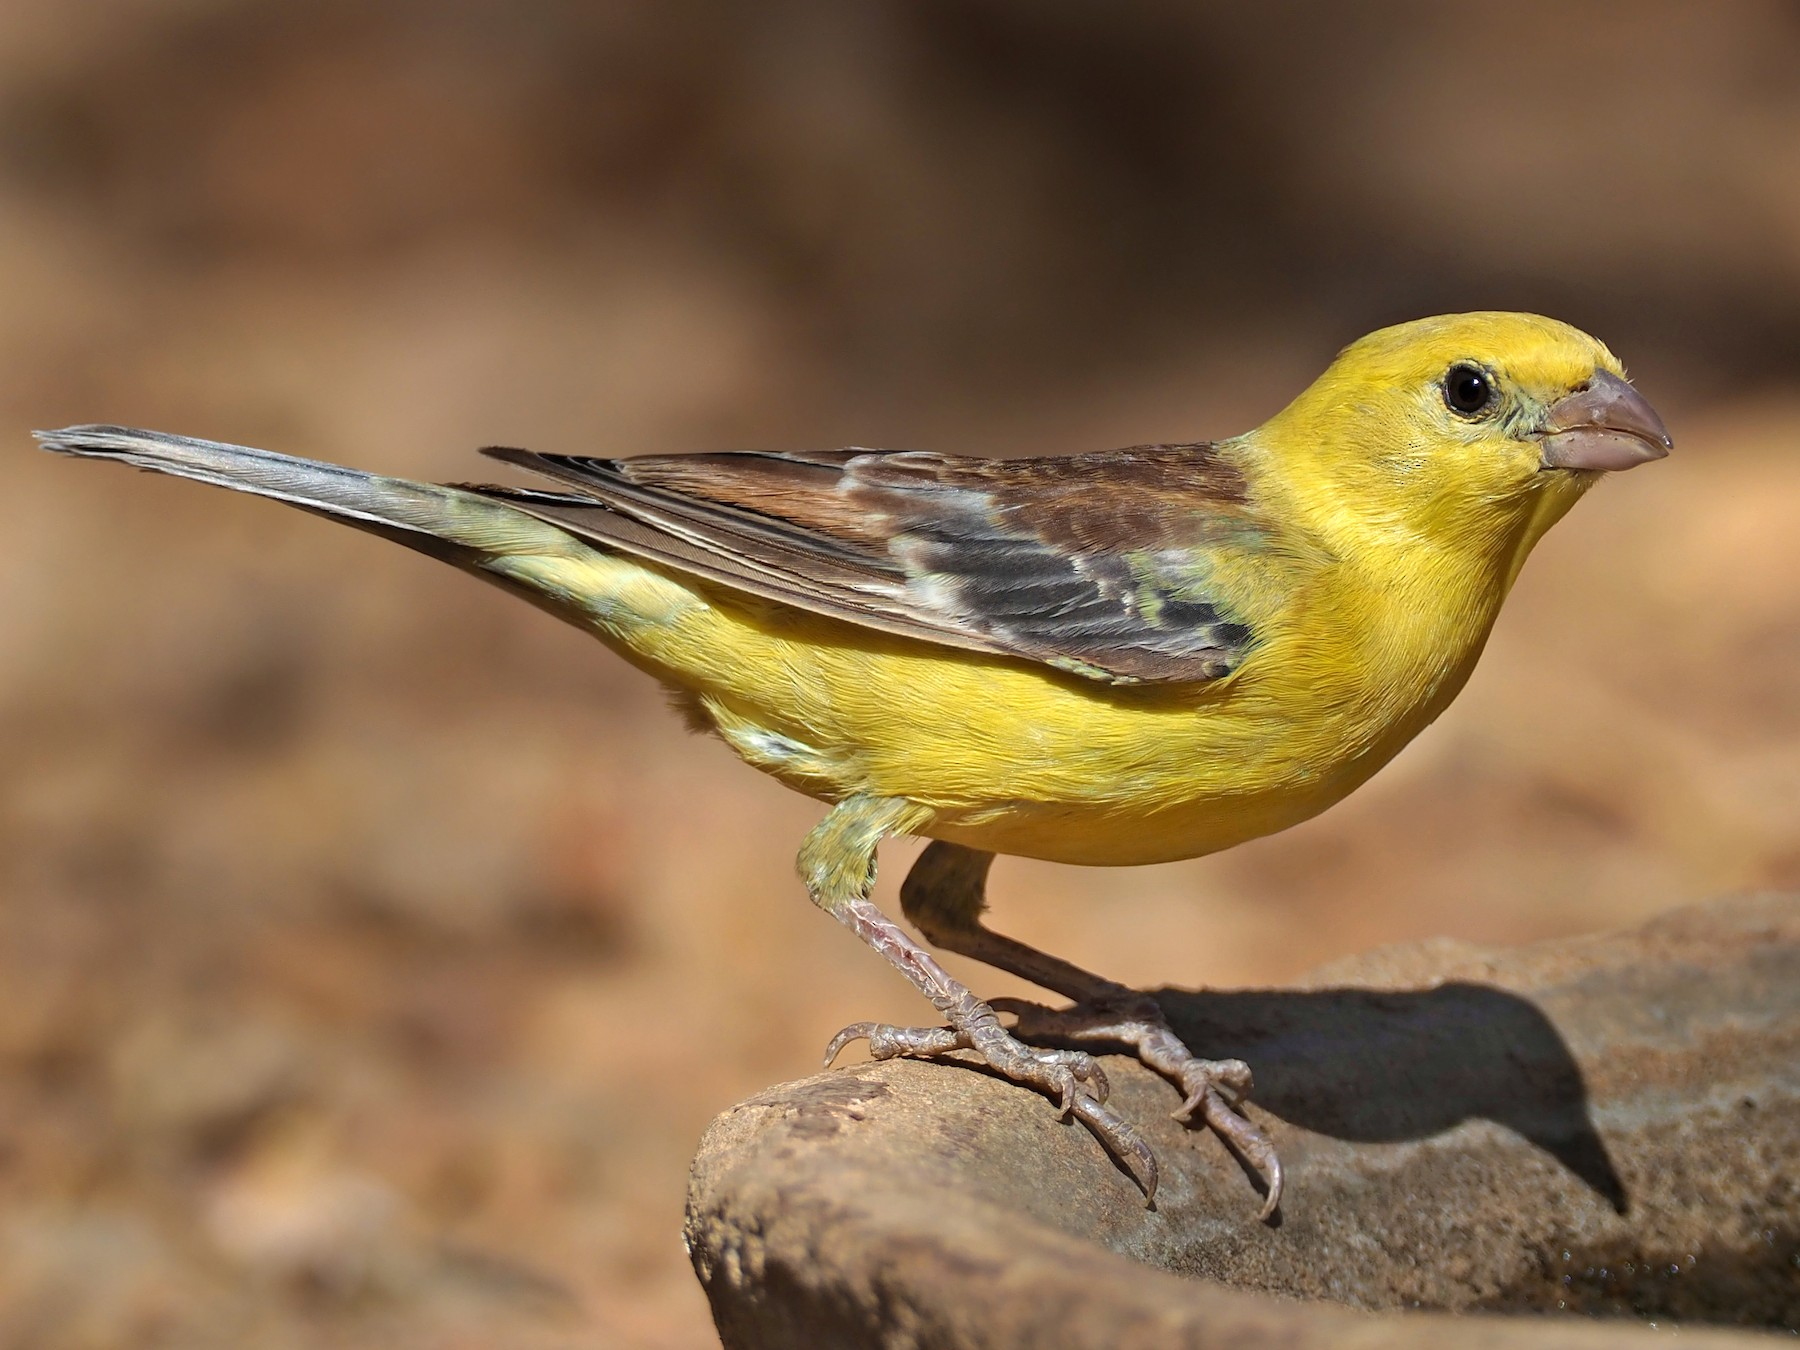 Sudan Golden Sparrow - Andrew Spencer